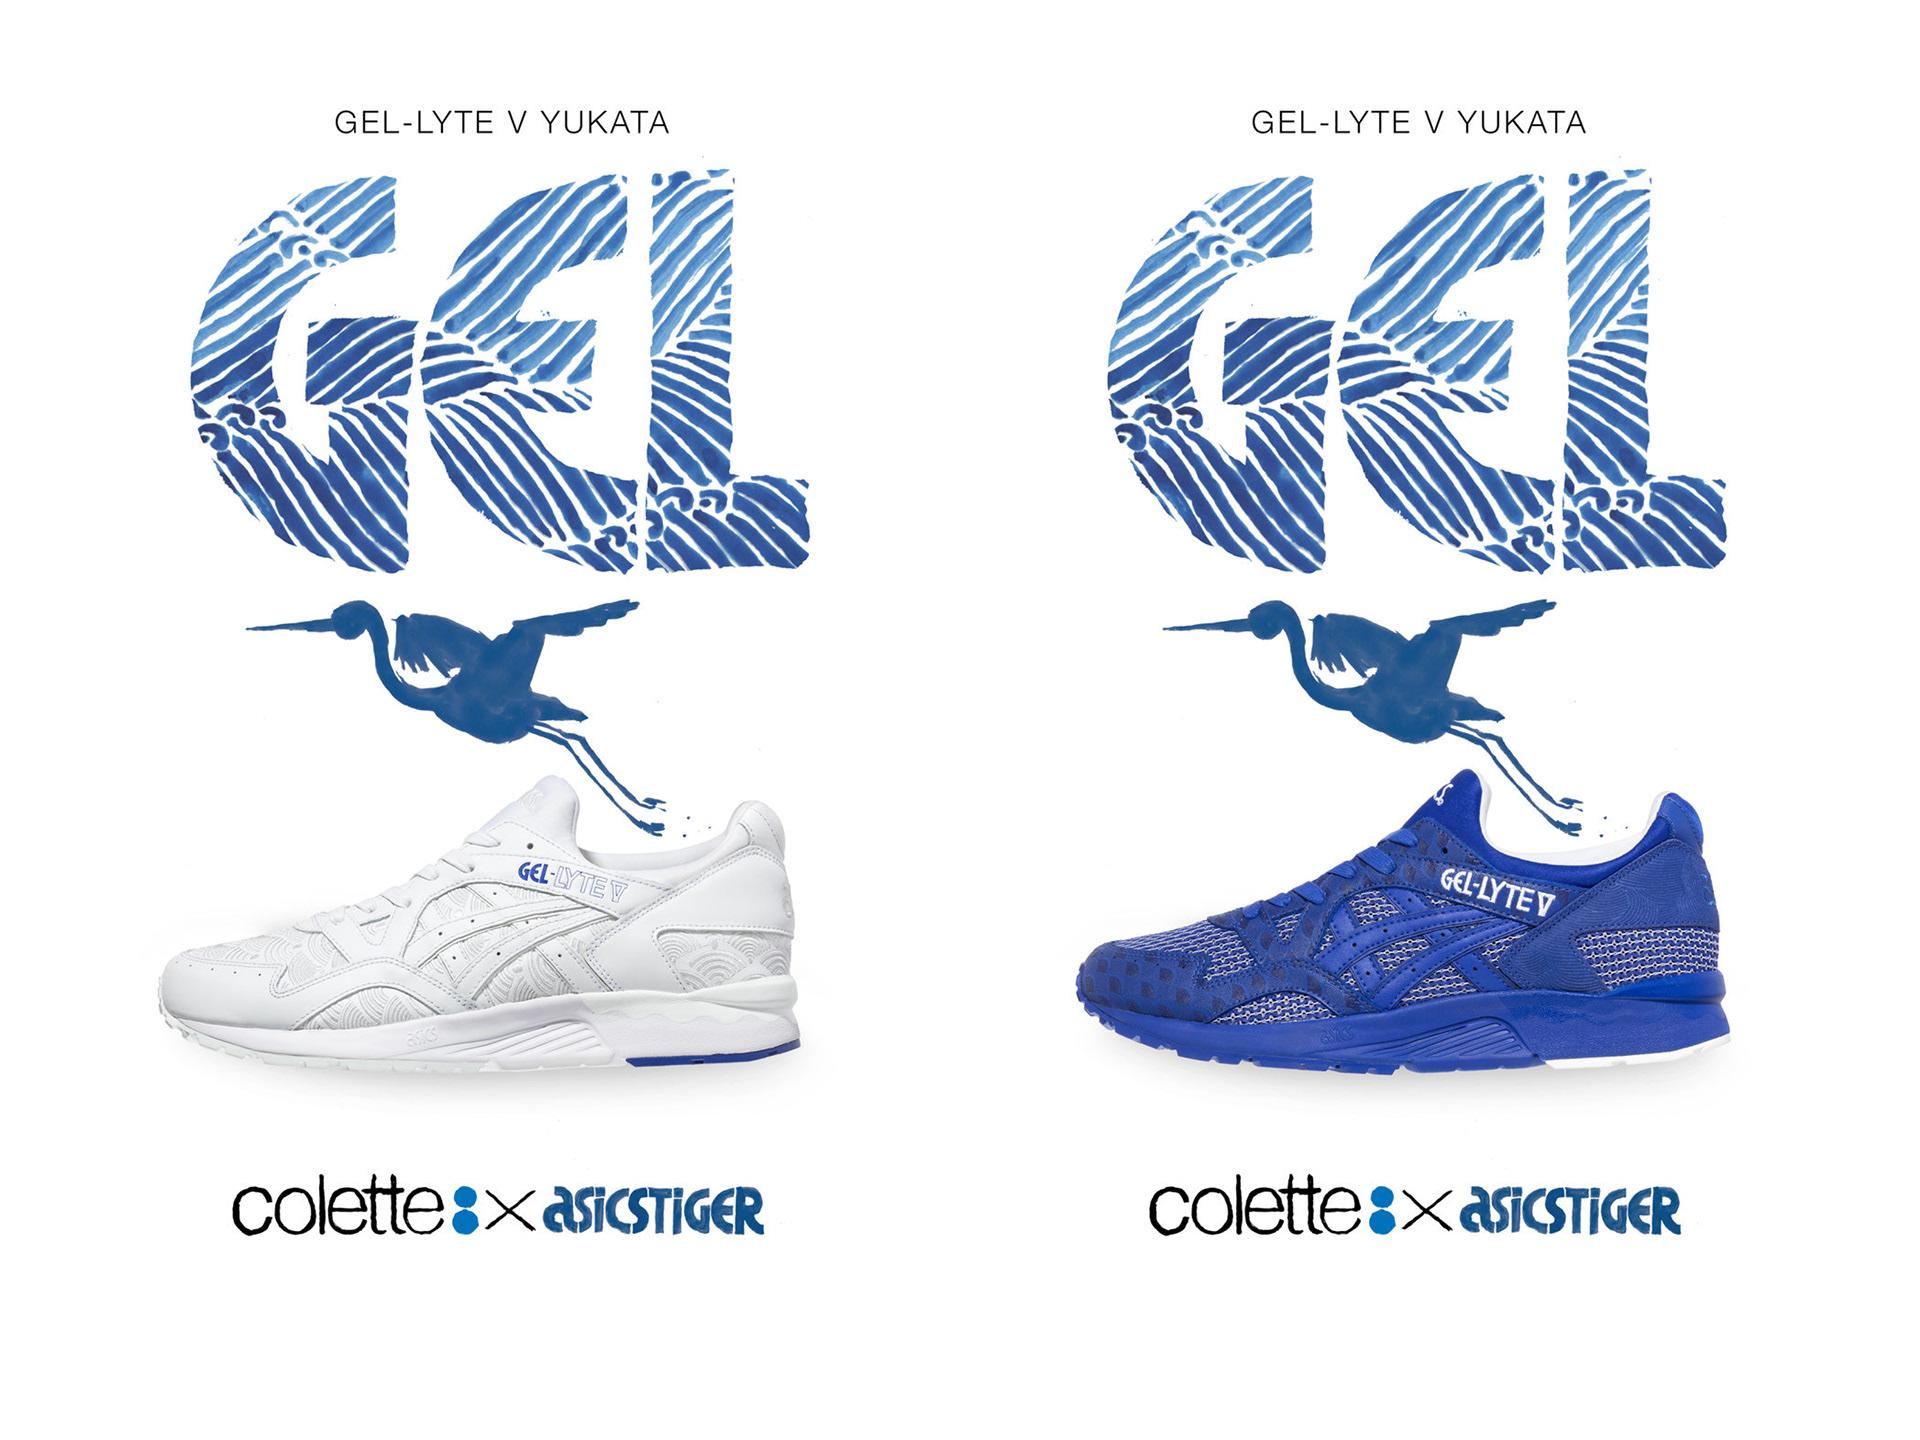 Forma del barco Lo siento Altitud  Clara Wassak Graphic Design - COLETTE x ASICS Tiger: The Flight of Summer